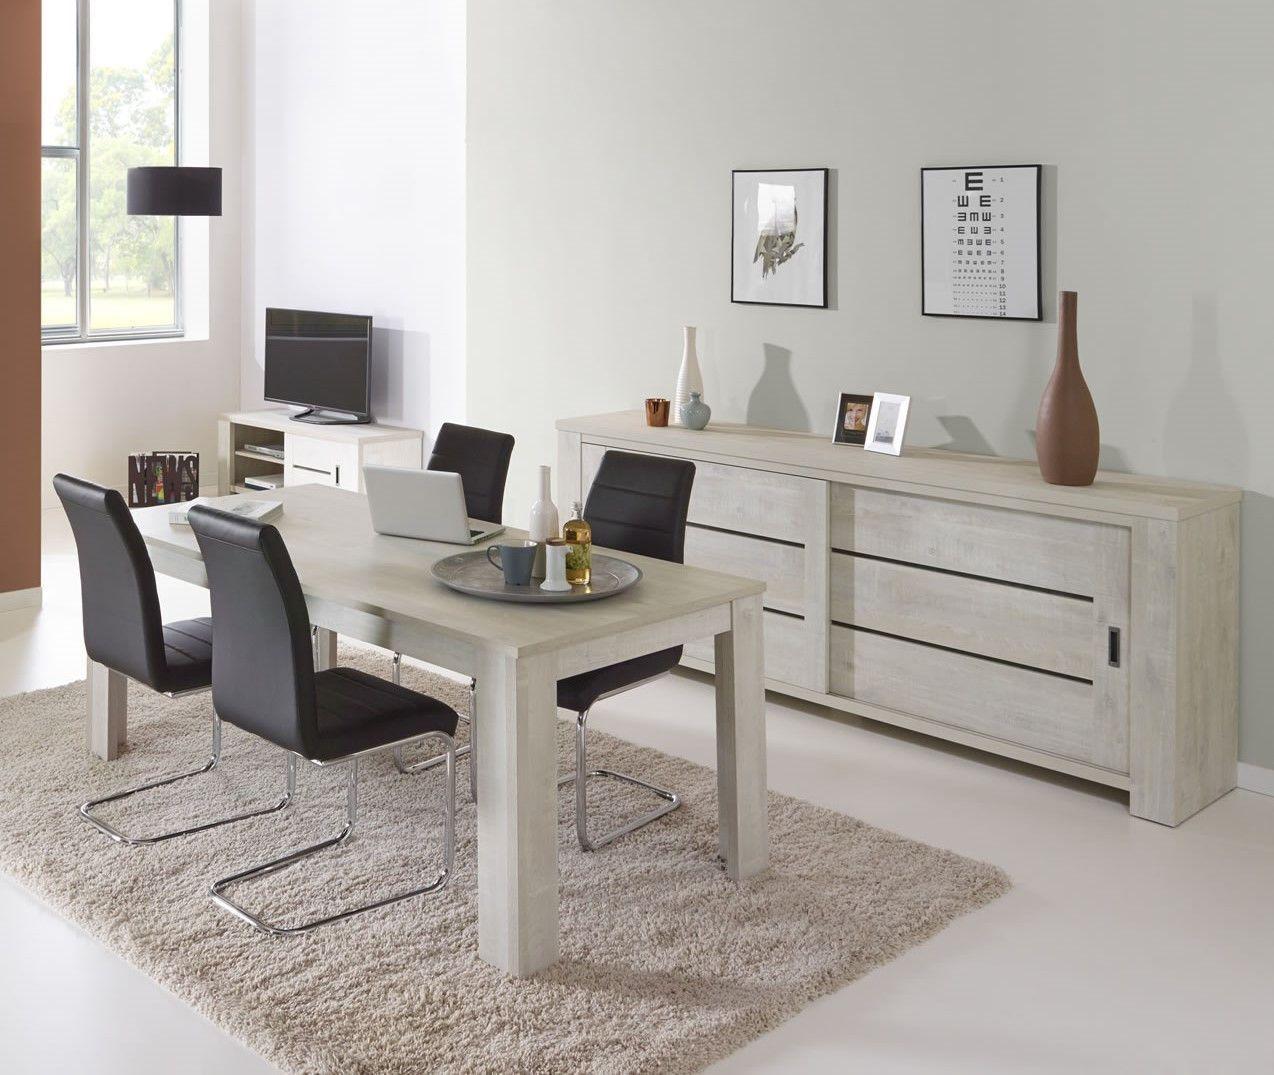 salle manger ch ne blanchi drancy vaisselier table et bahut. Black Bedroom Furniture Sets. Home Design Ideas